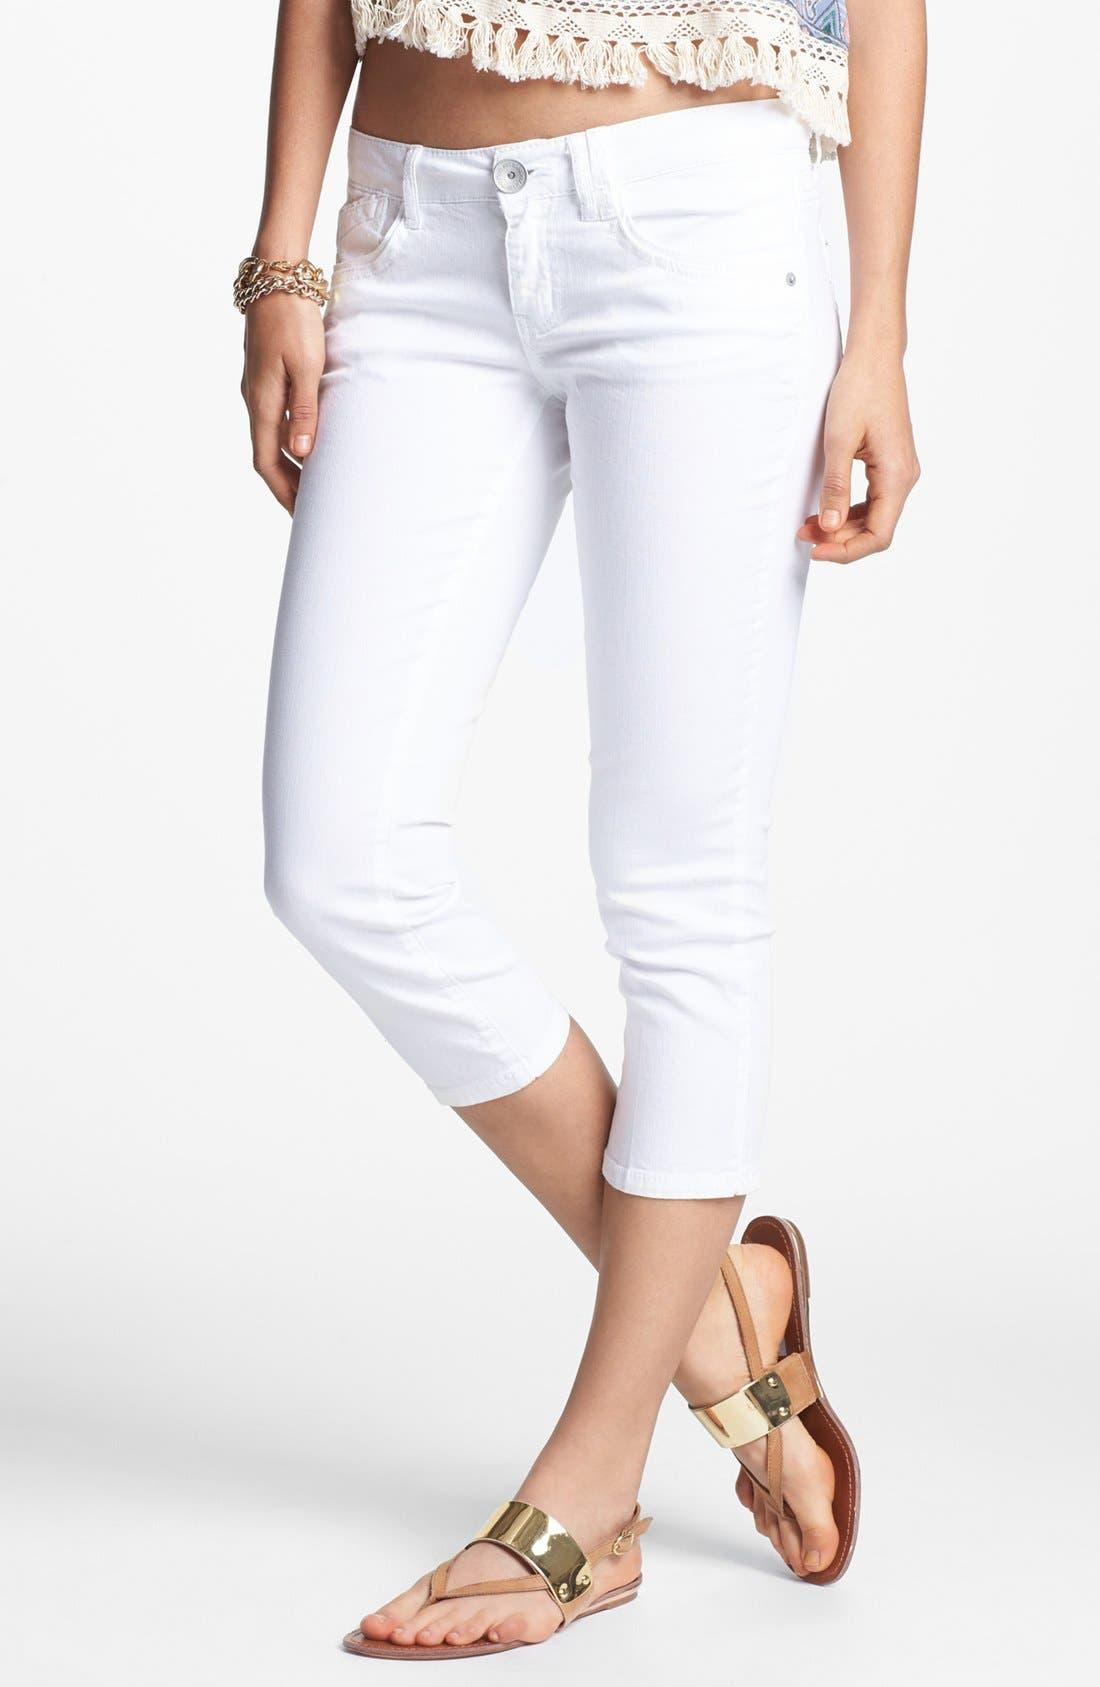 Alternate Image 1 Selected - Jolt Crop Skinny Jeans (White) (Juniors)